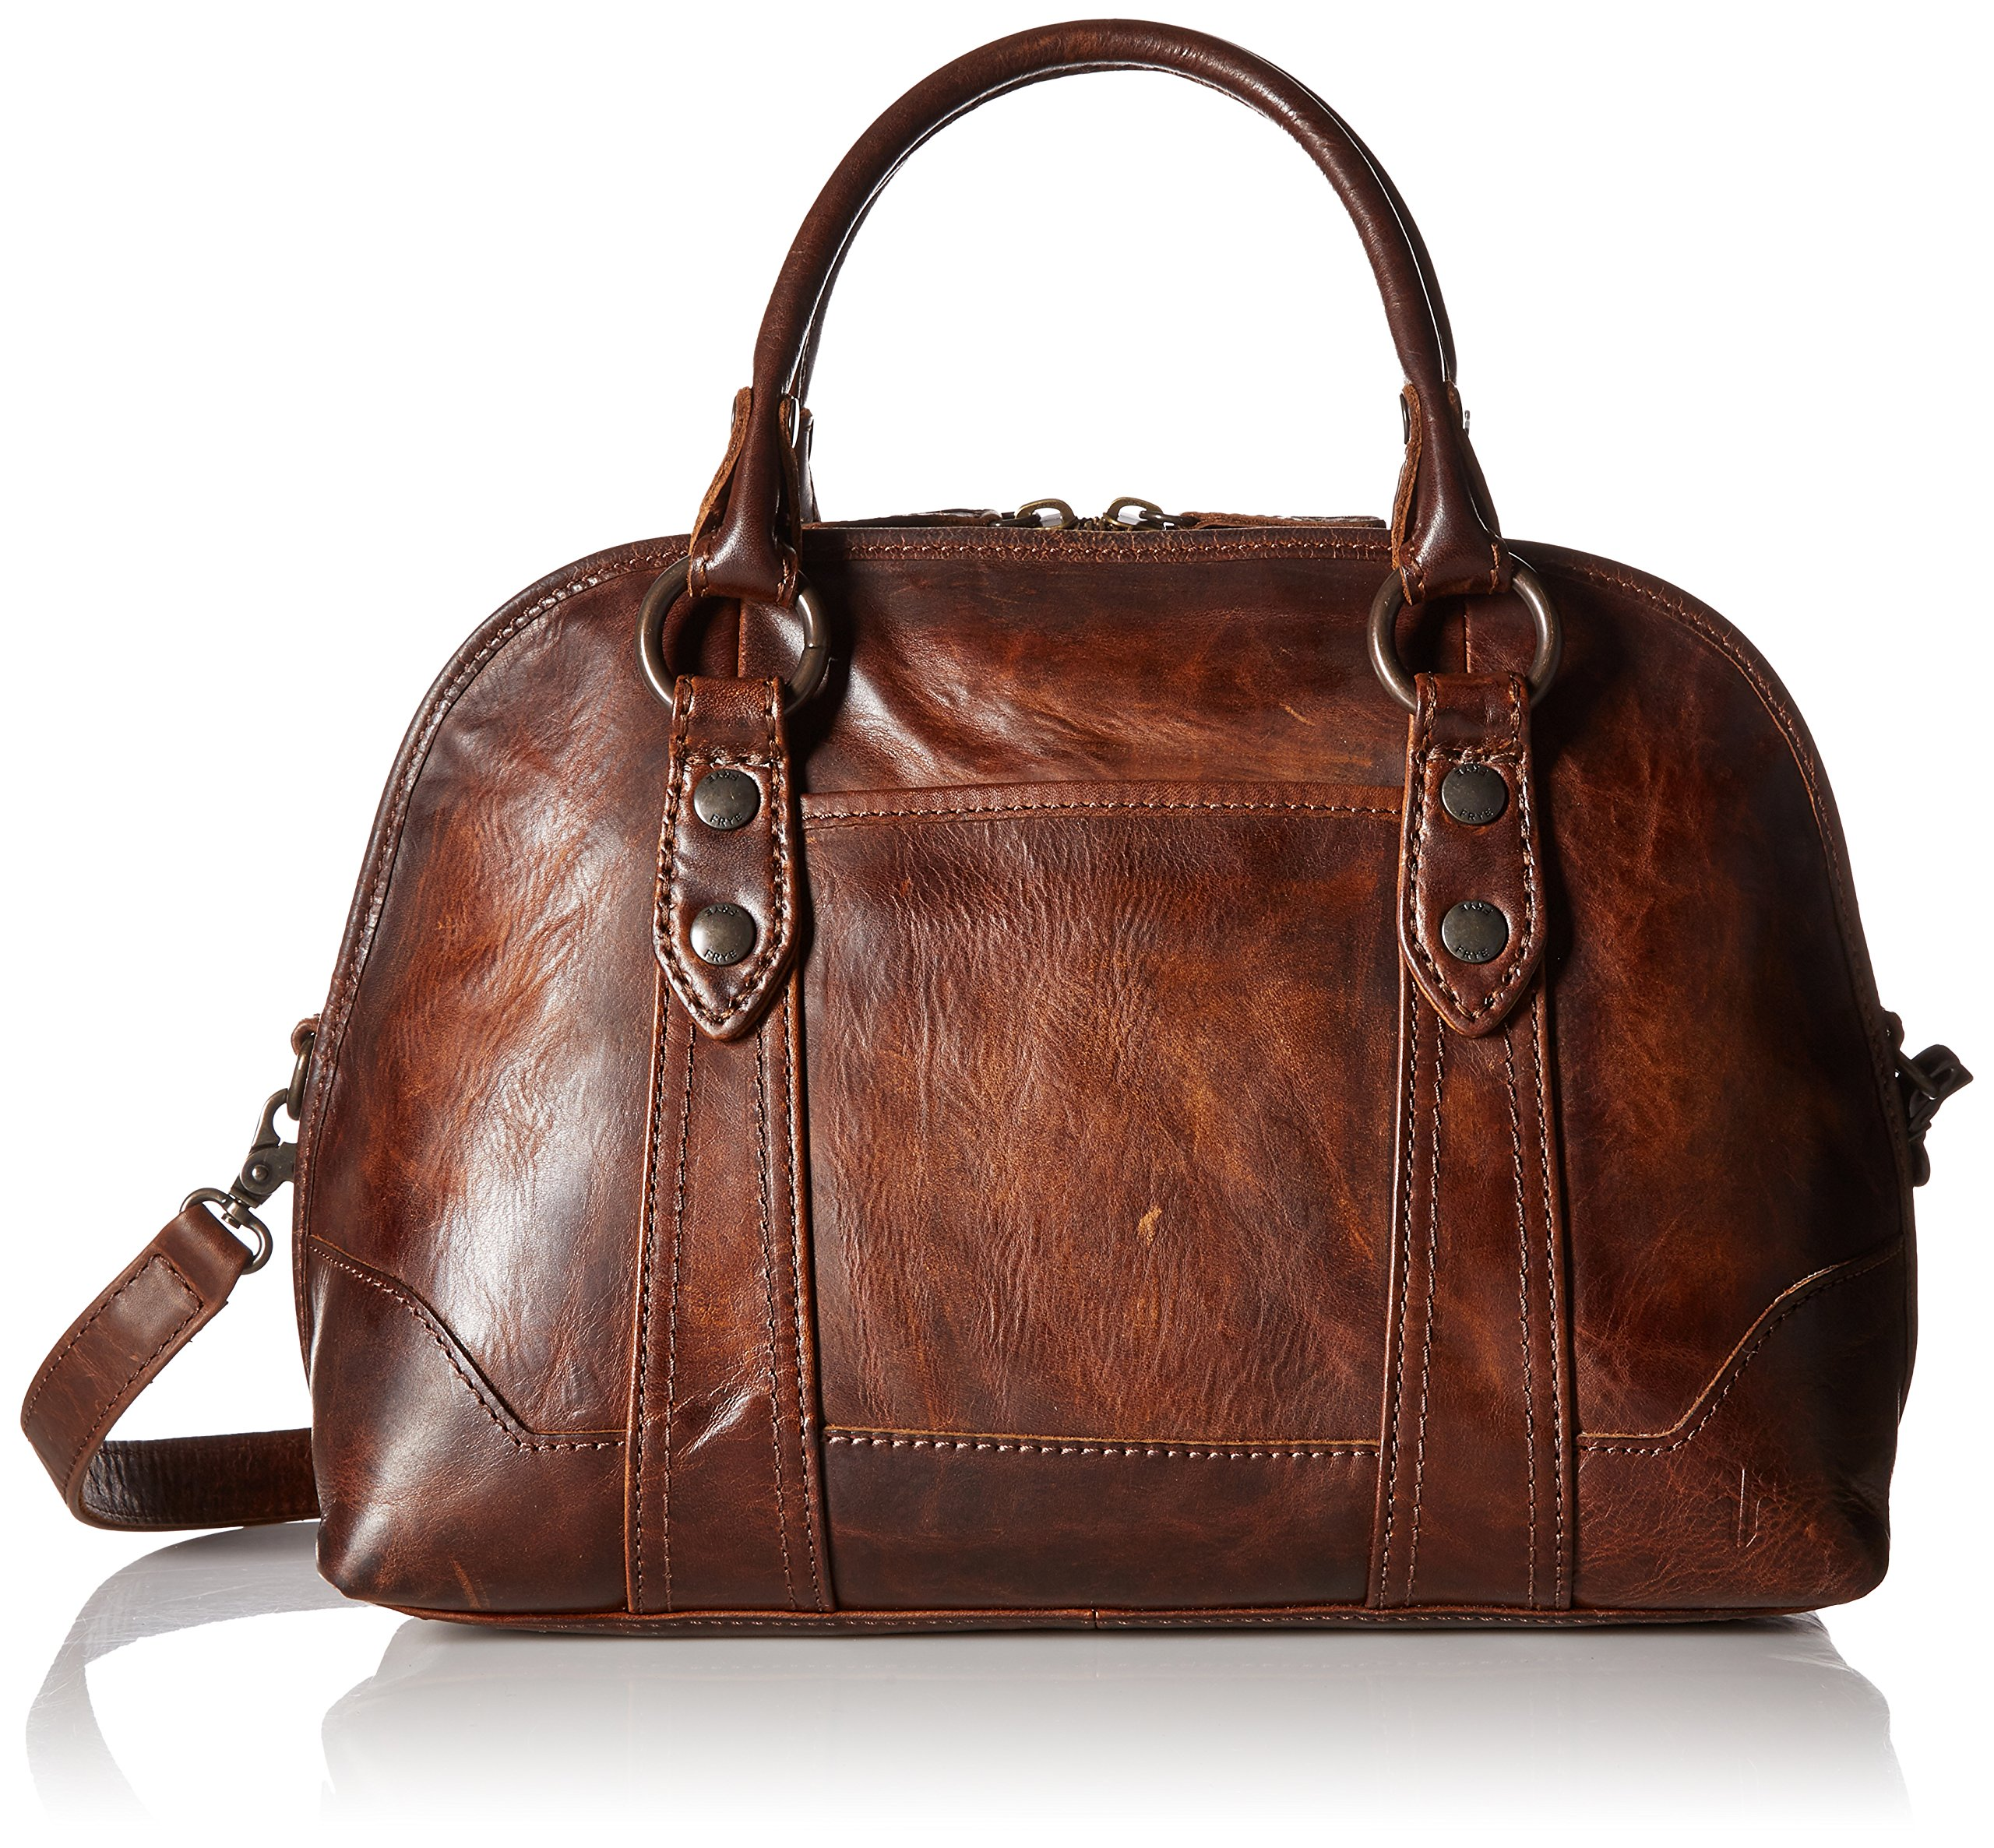 FRYE Melissa Domed Satchel Bag, Dark Brown, One Size by FRYE